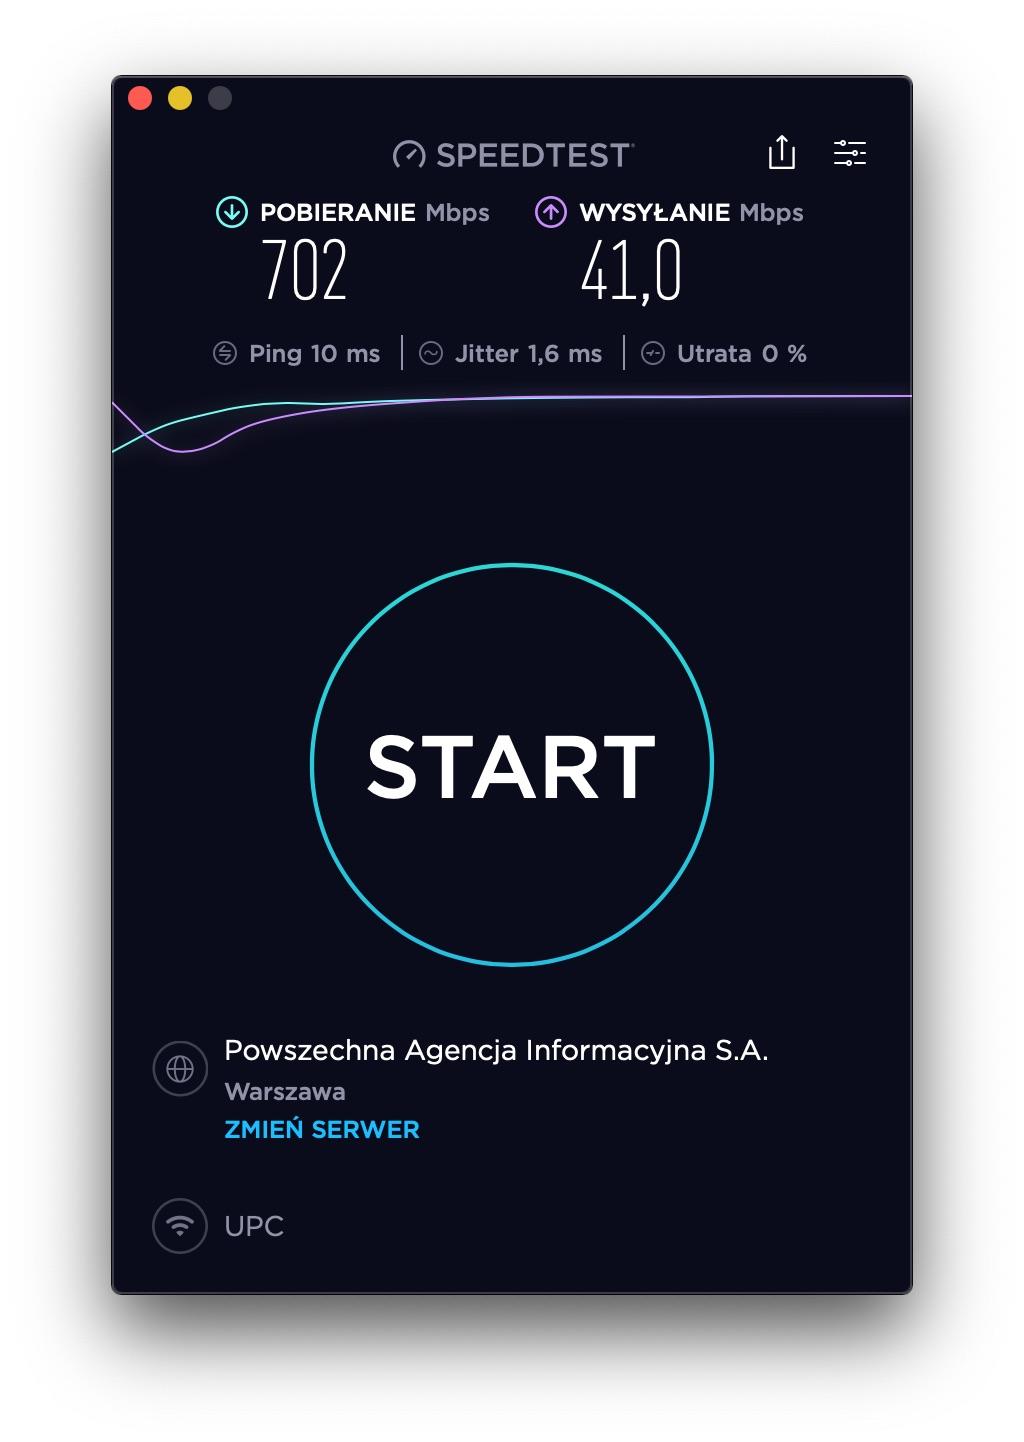 tp-link archer ax50 jaki router kupić